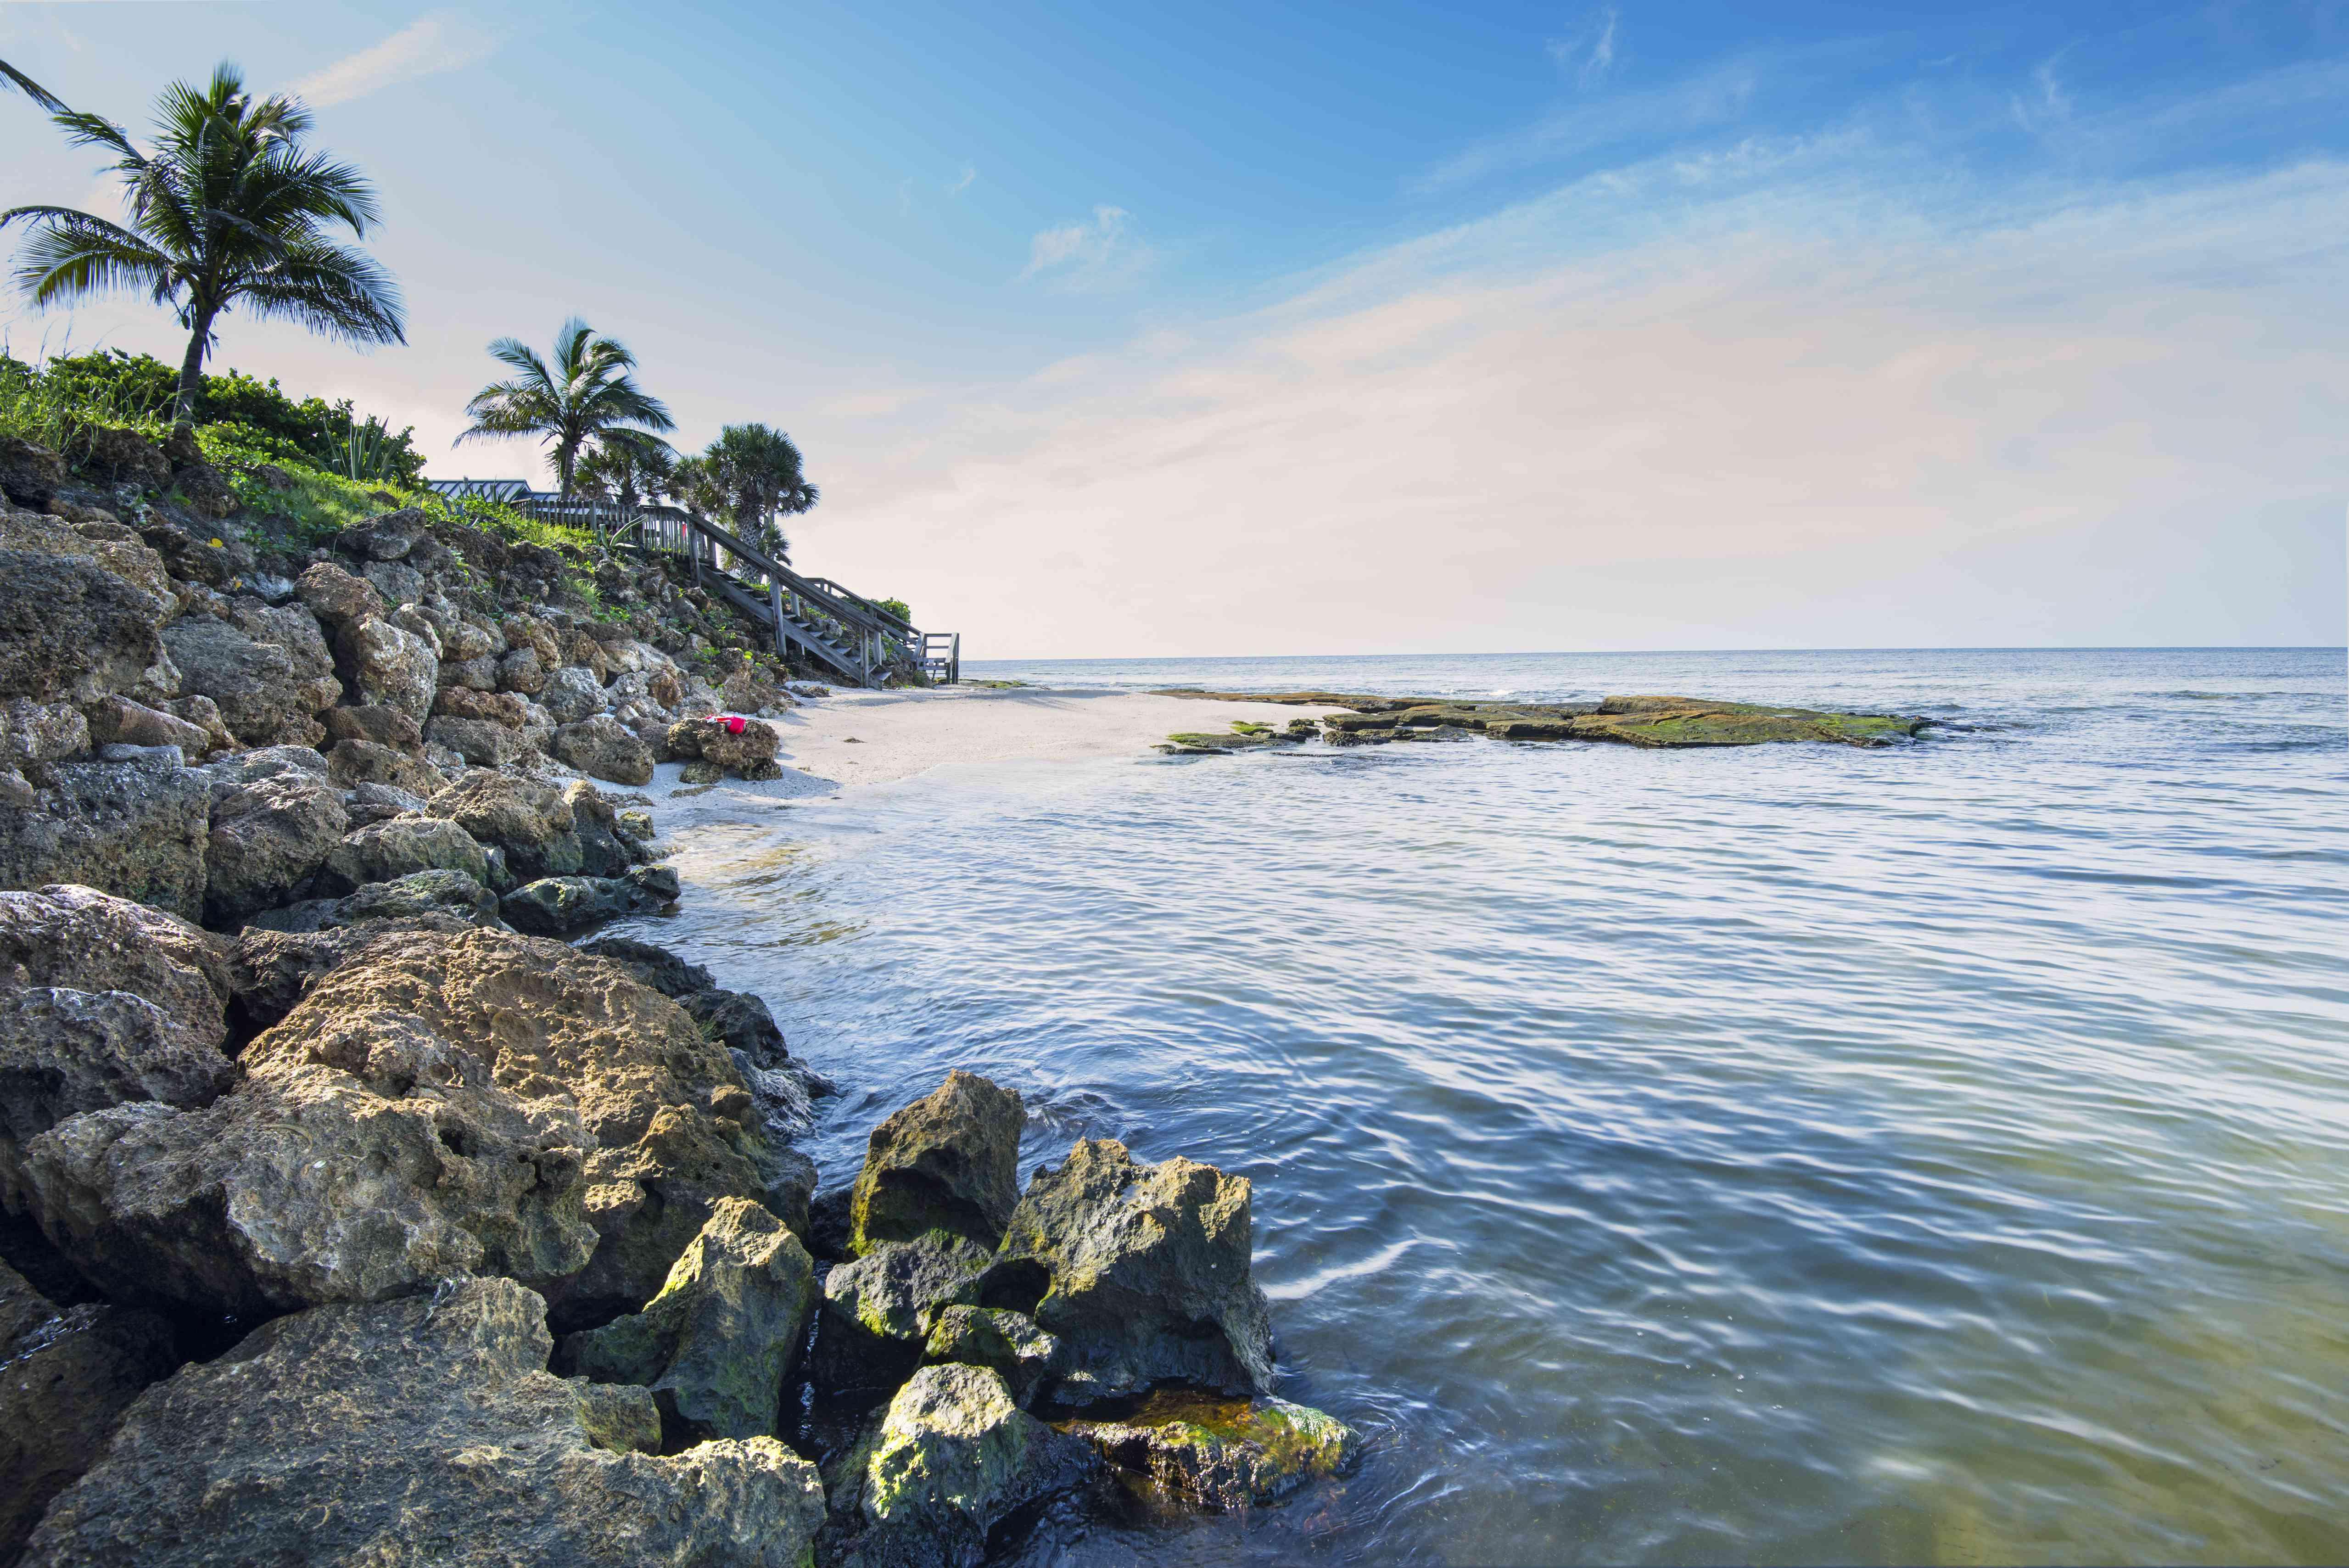 Florida, Siesta Key, Point Of Rocks, Limestone Formations, Gulf Of Mexico